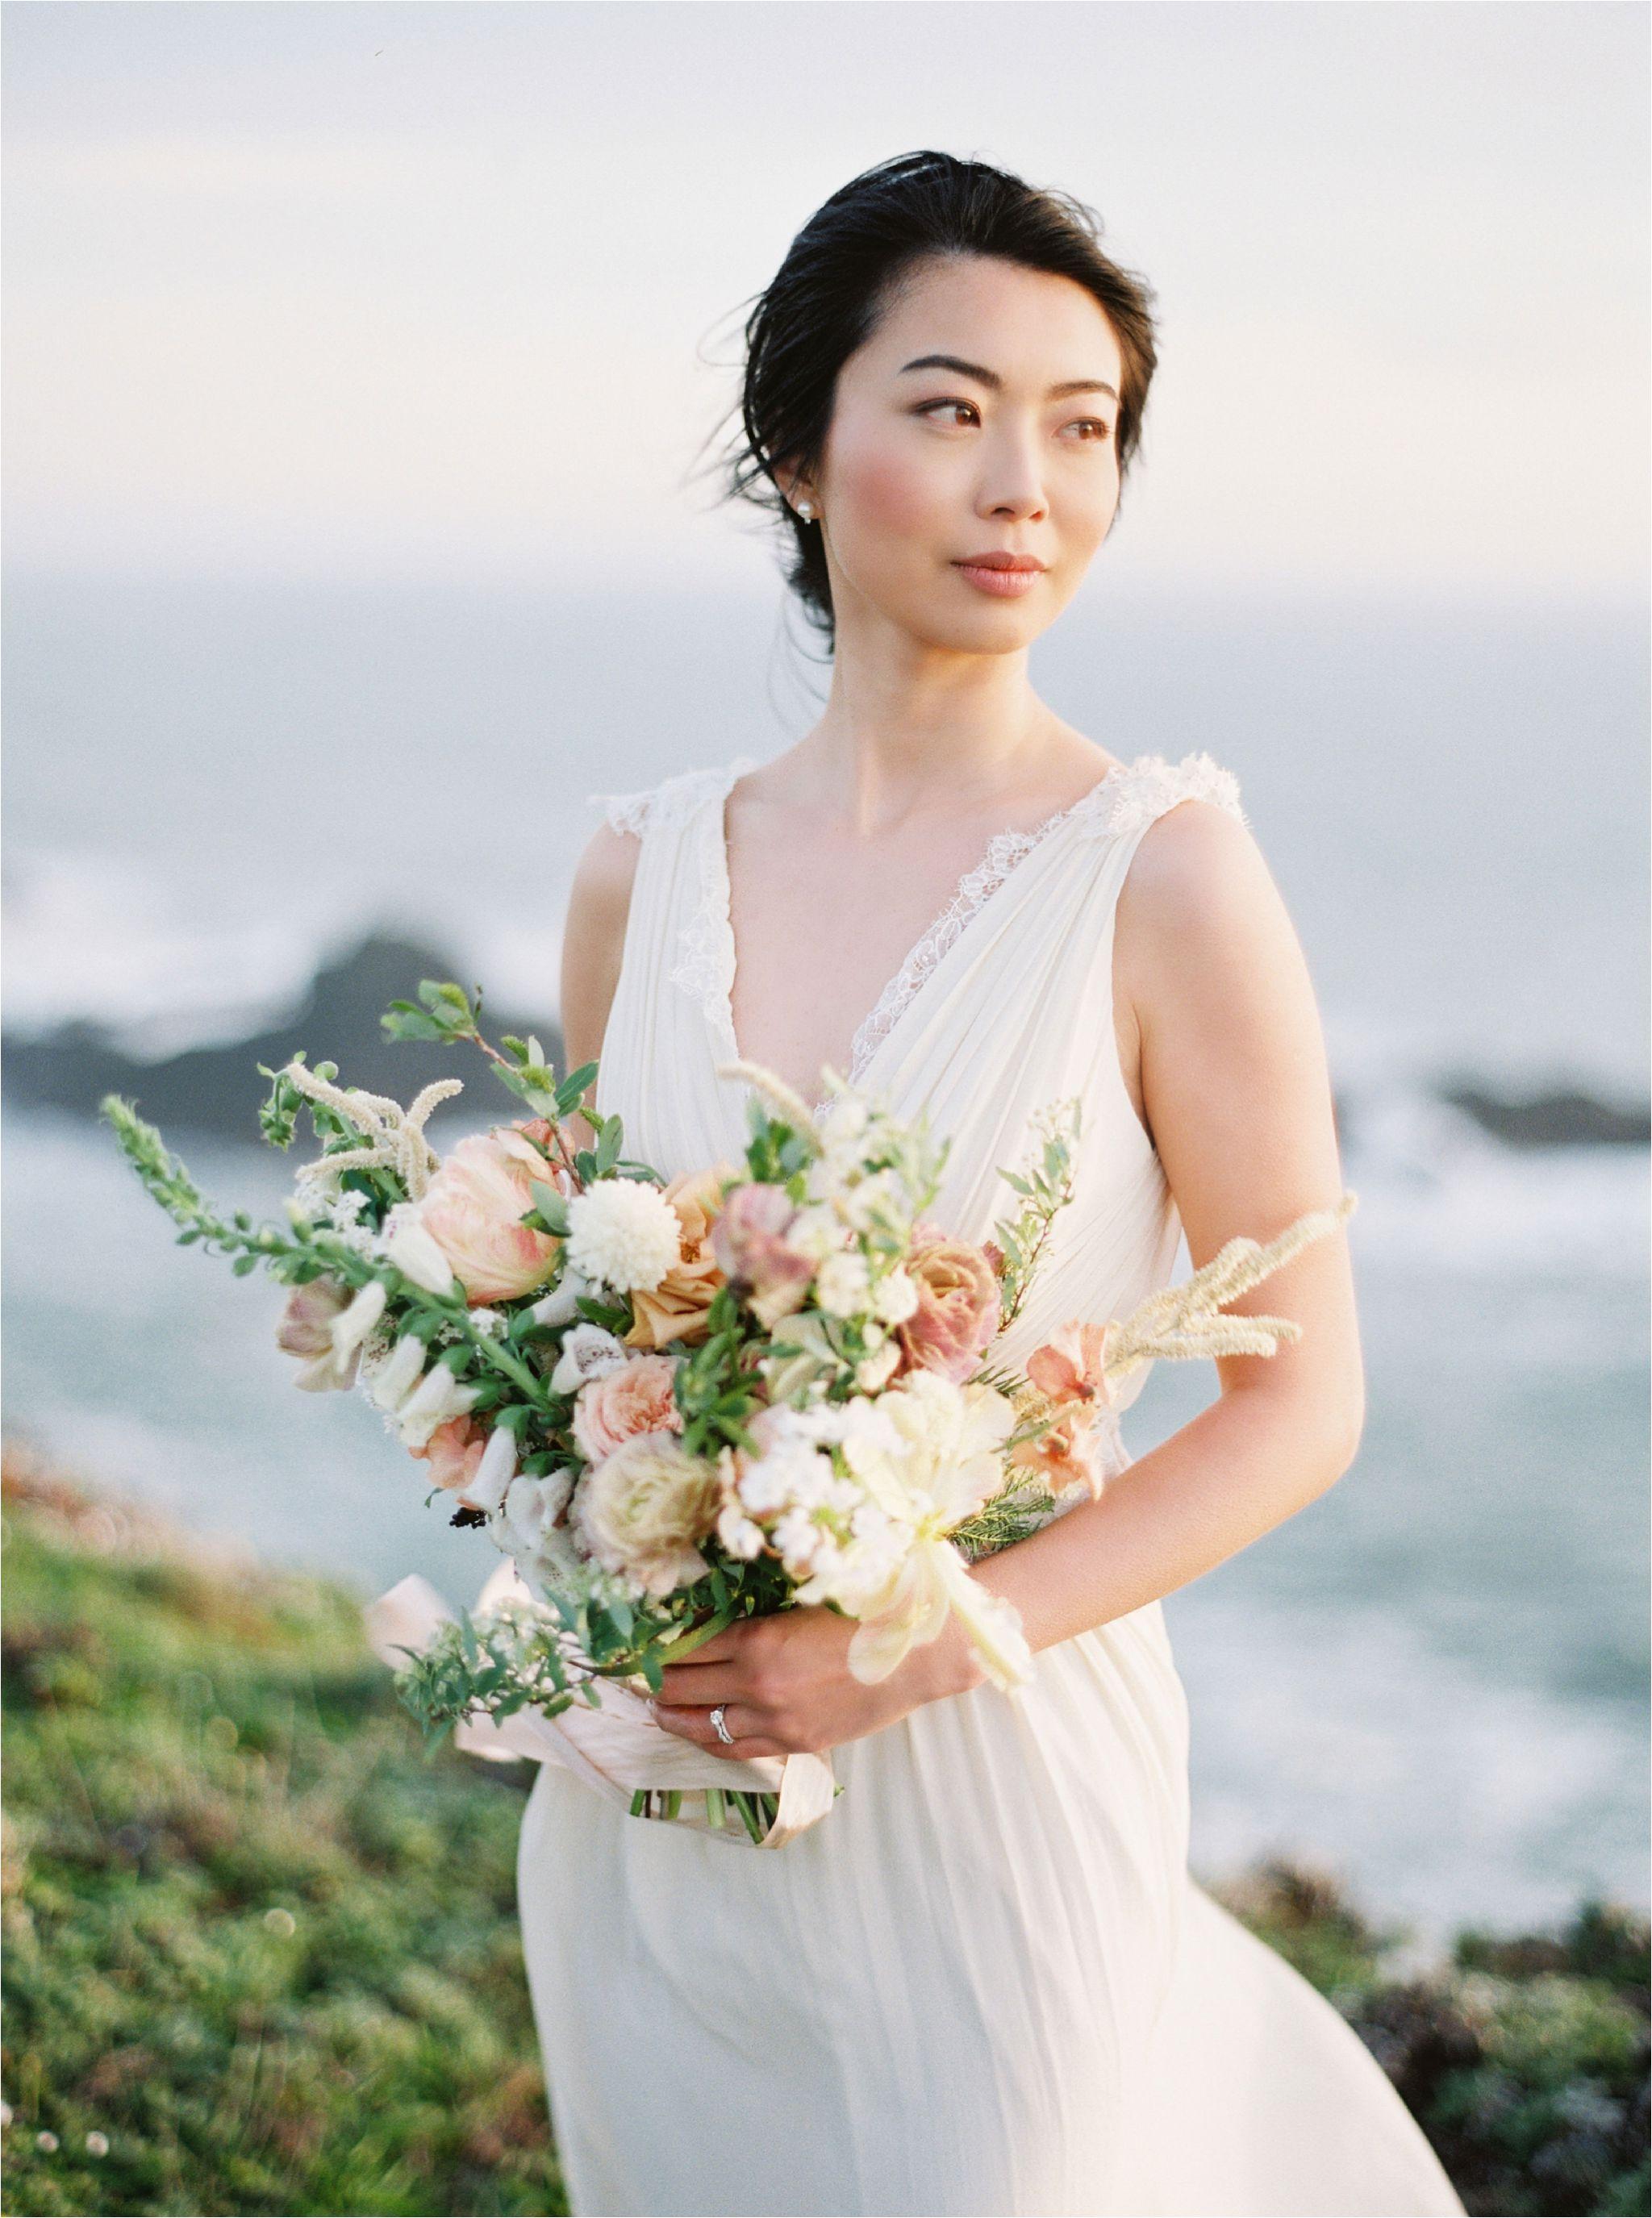 california_coast_mendicino_cuffeyscoveranch_wedding_elopement_photography00062.jpg